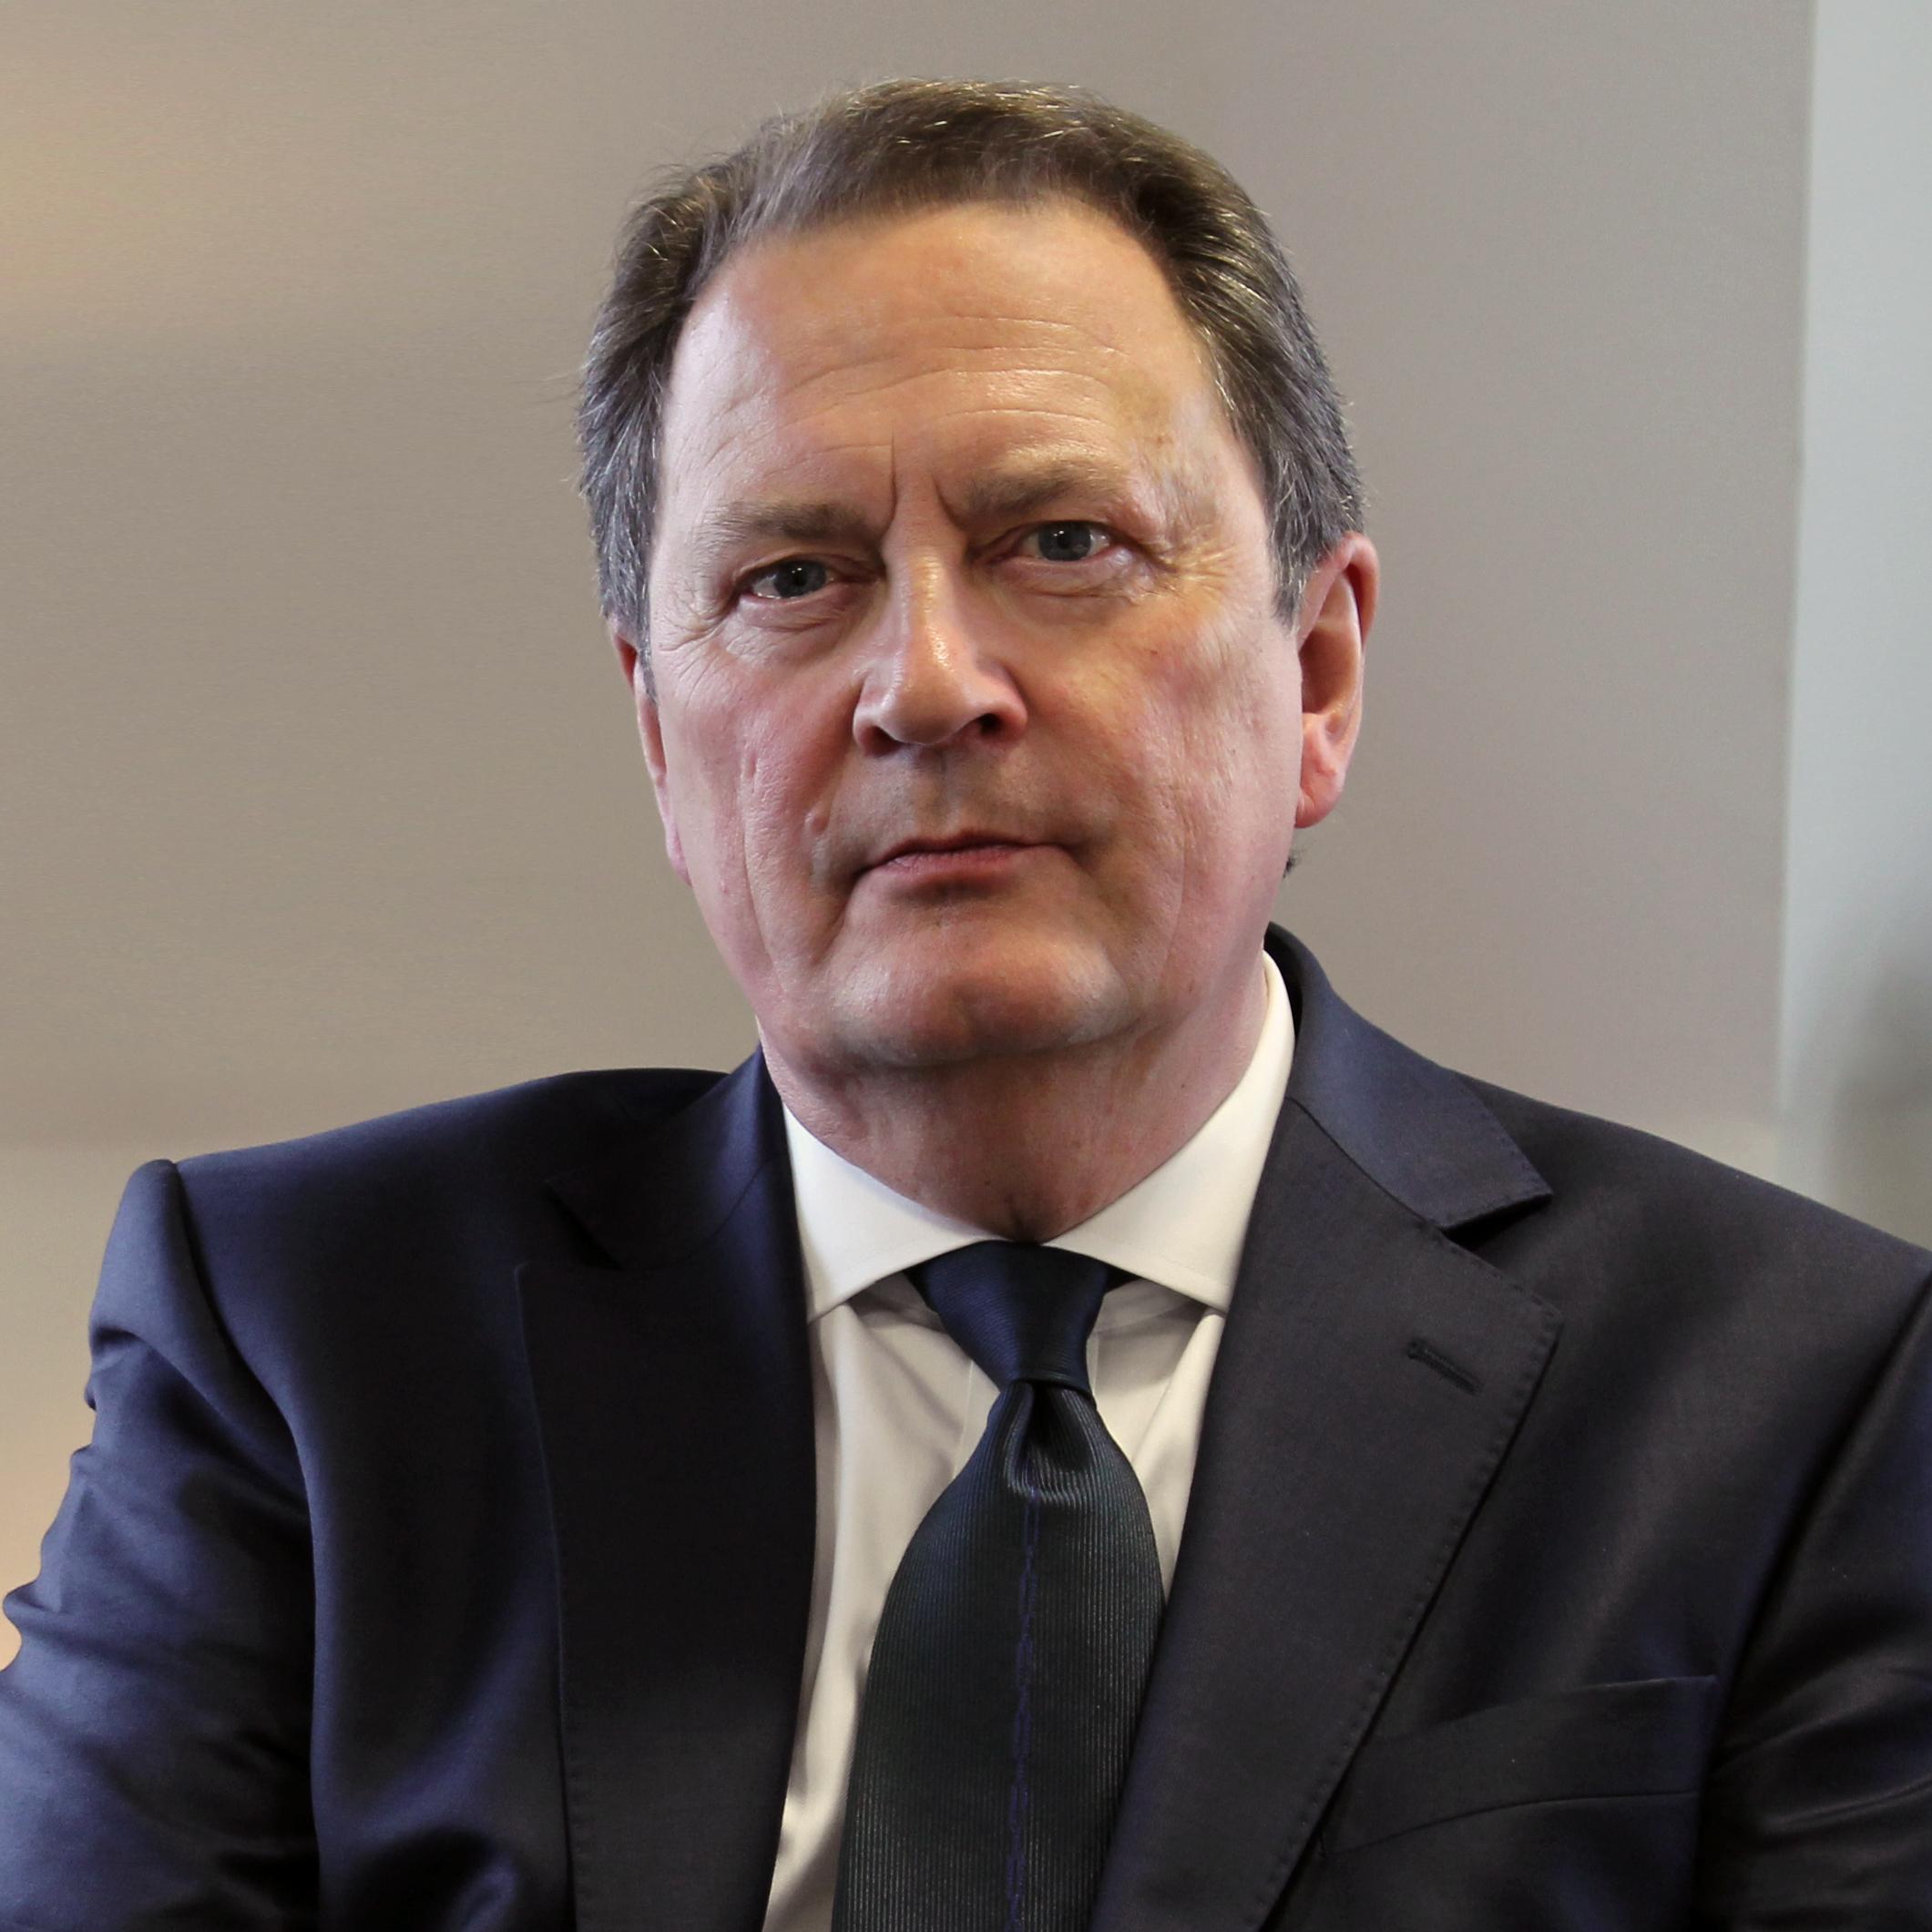 David Green to head SFO until 2018